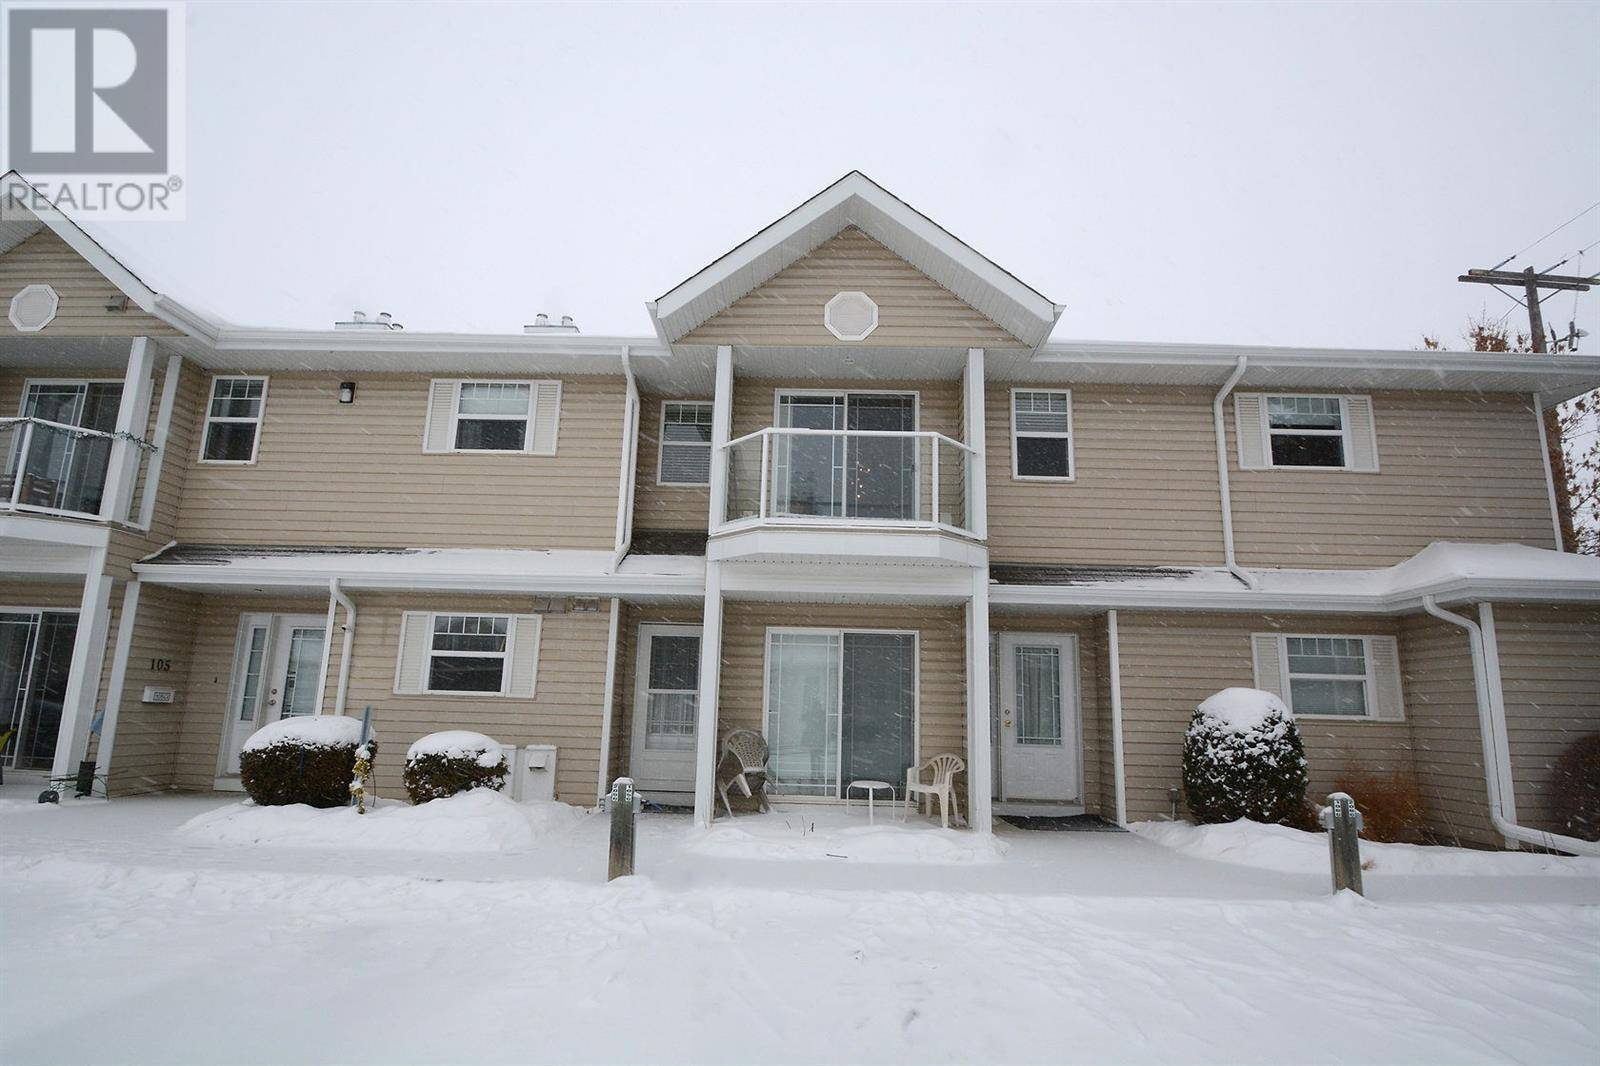 Townhouse for sale at 141 105th St W Unit 206g Saskatoon Saskatchewan - MLS: SK797530